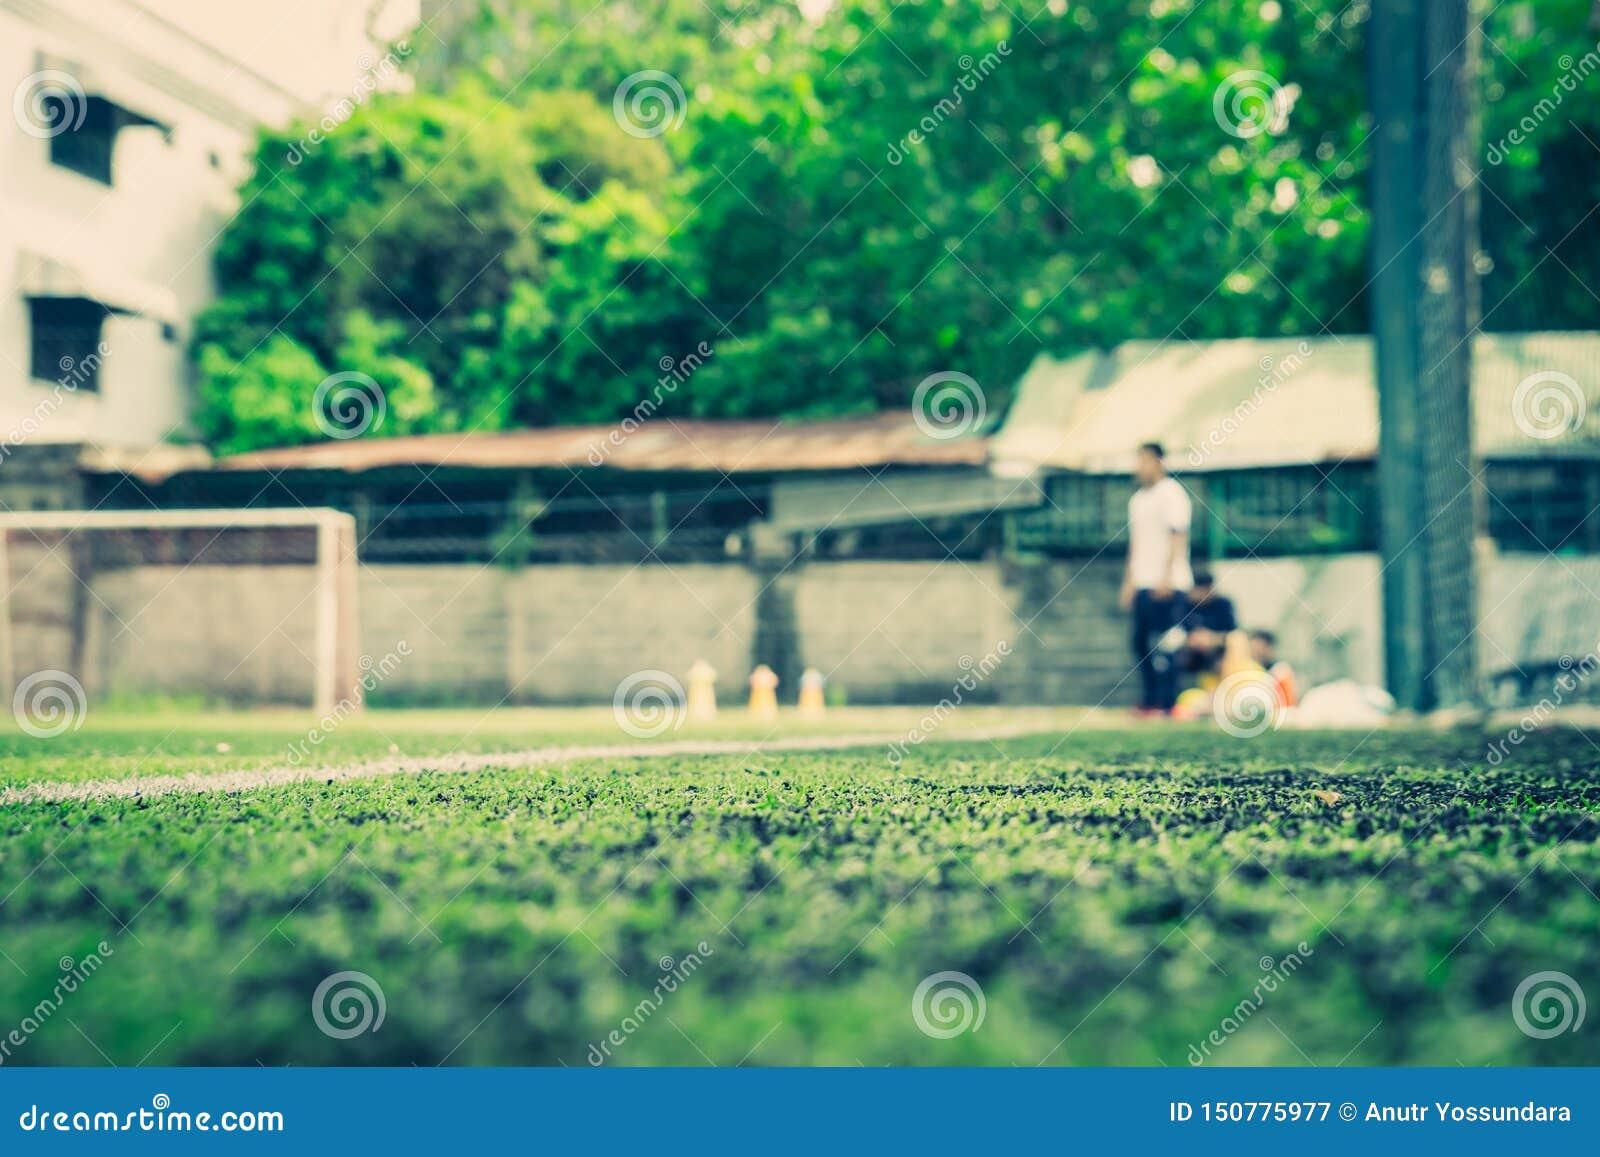 Soccer field for children training blurred for background